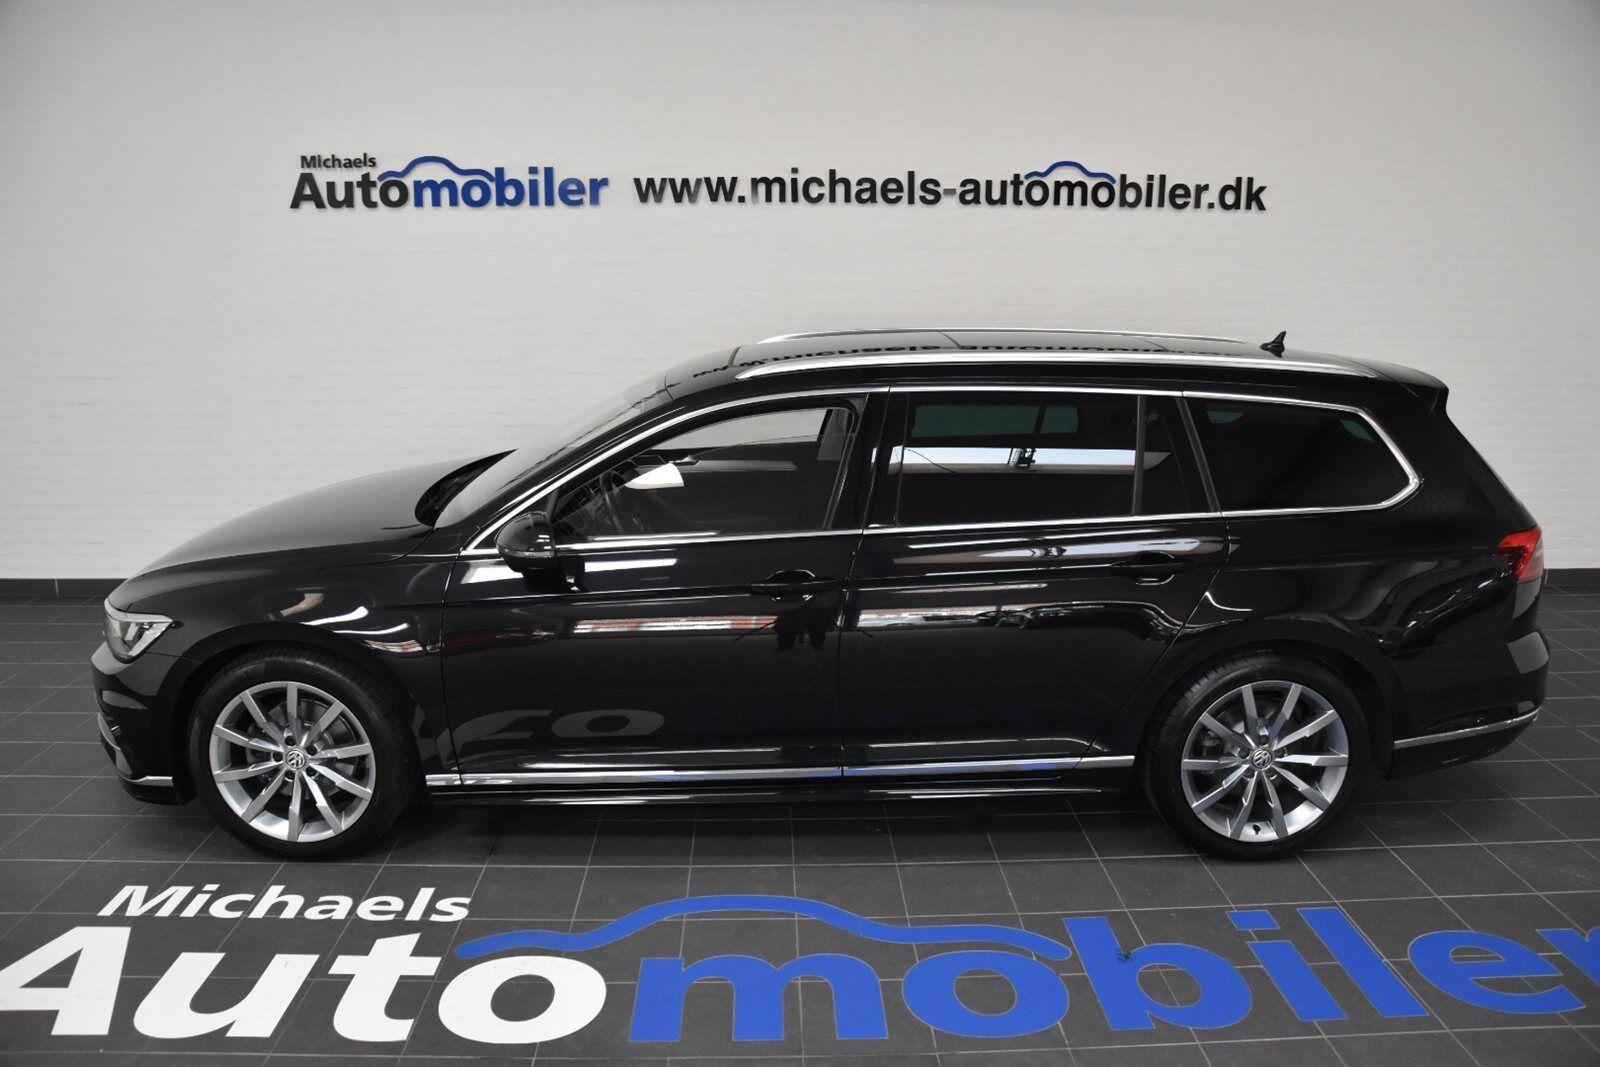 VW Passat 2,0 TDi 190 Highl. Variant DSG 5d - 379.900 kr.